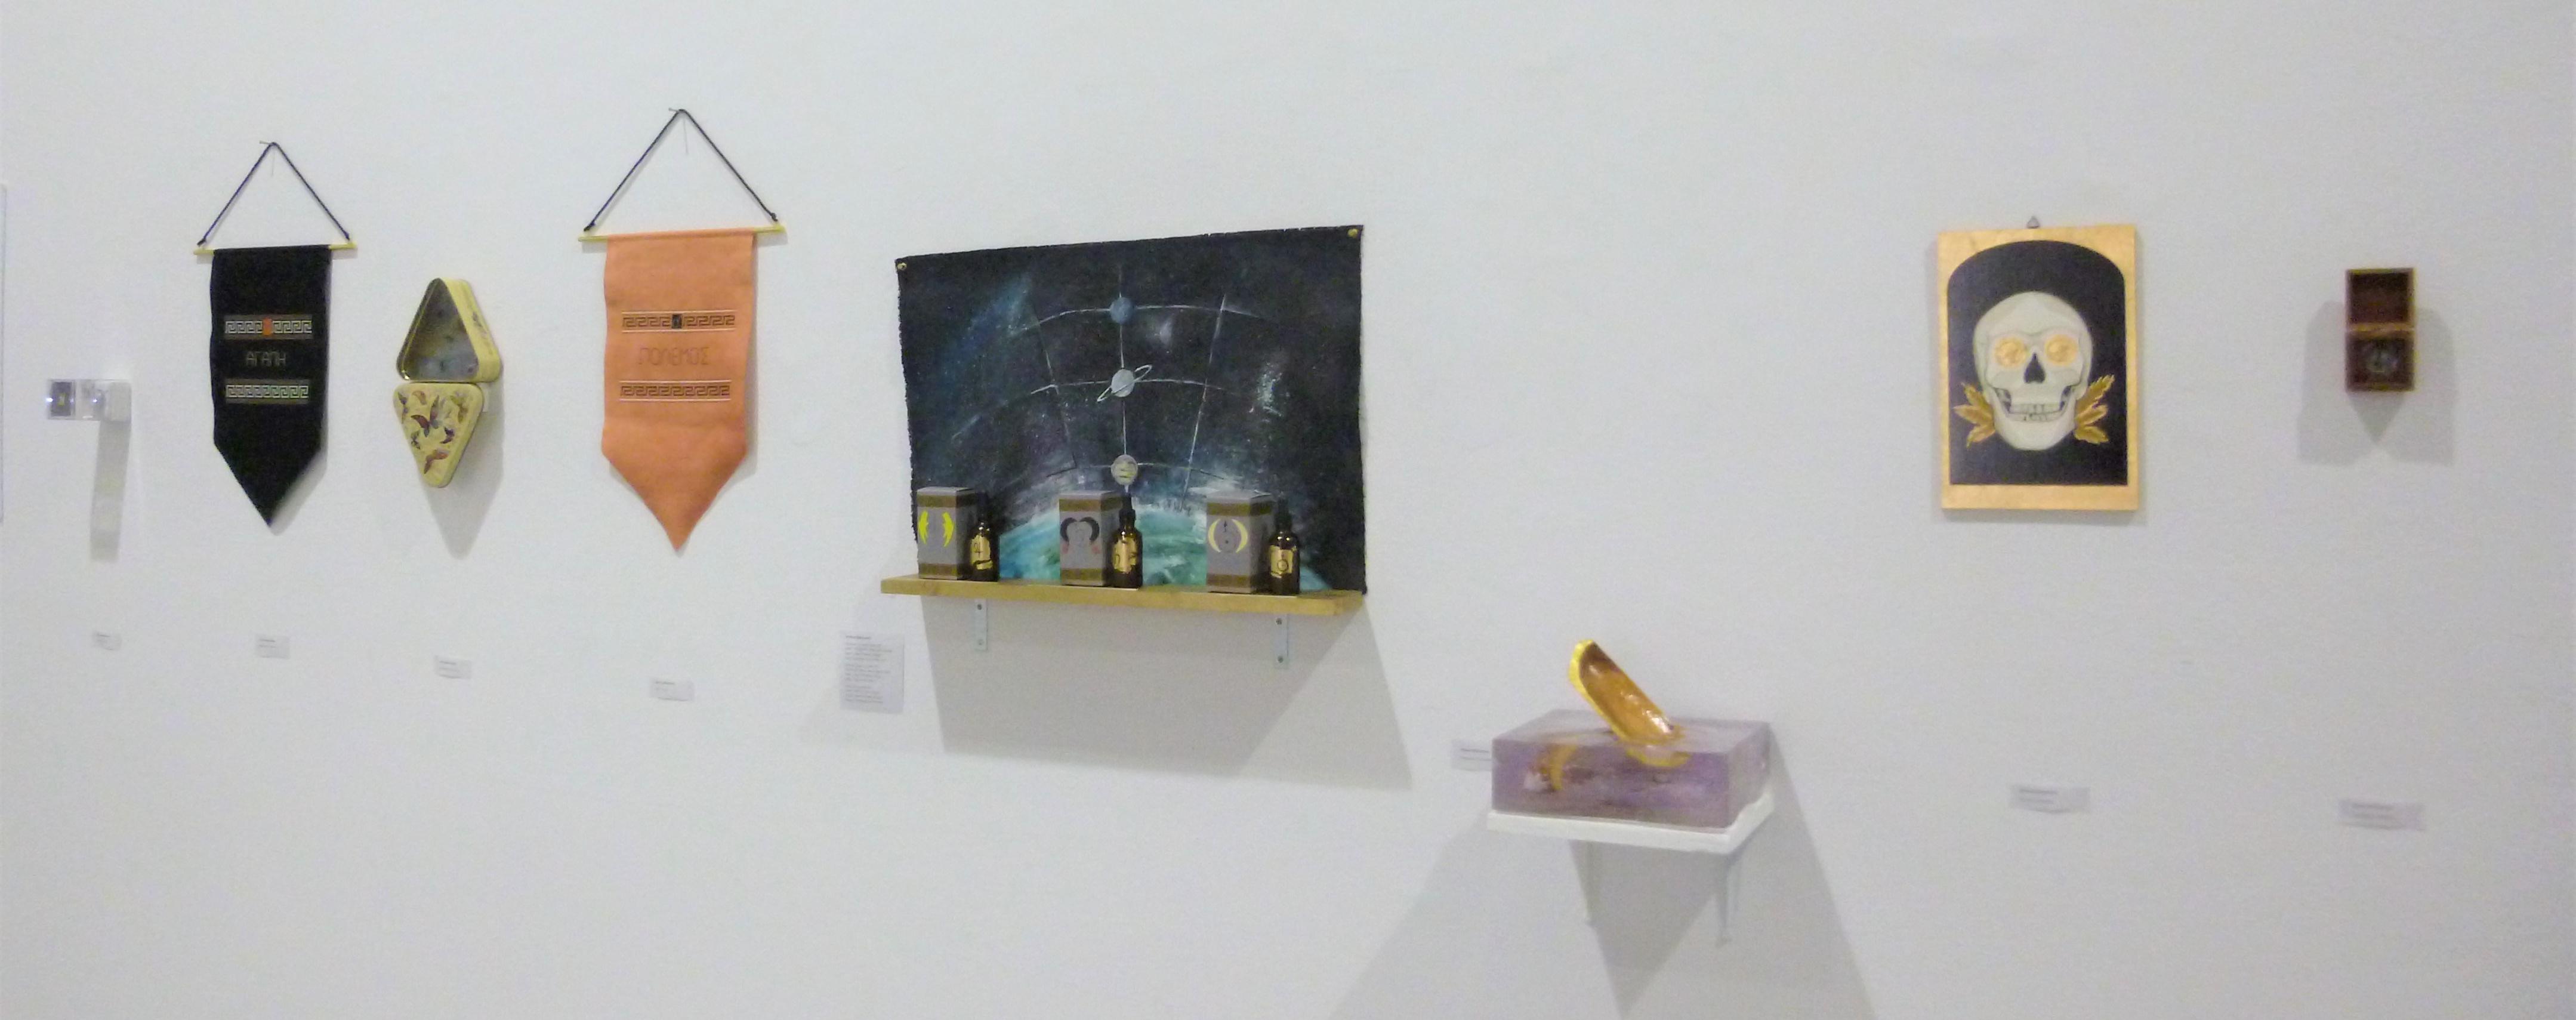 planets-exhibition.jpg